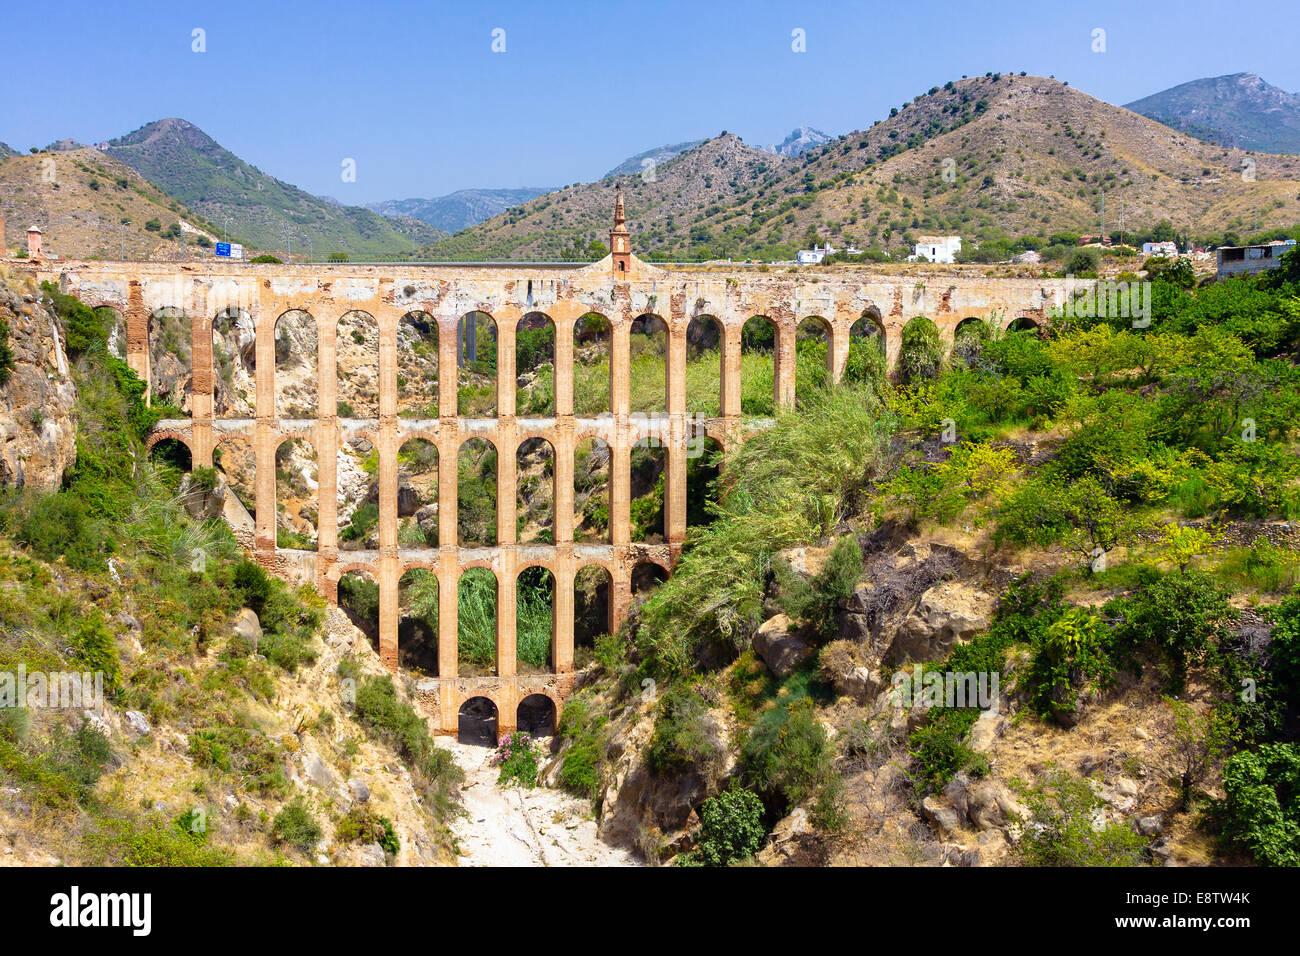 Alten Aquädukt in Nerja, Spanien Stockbild